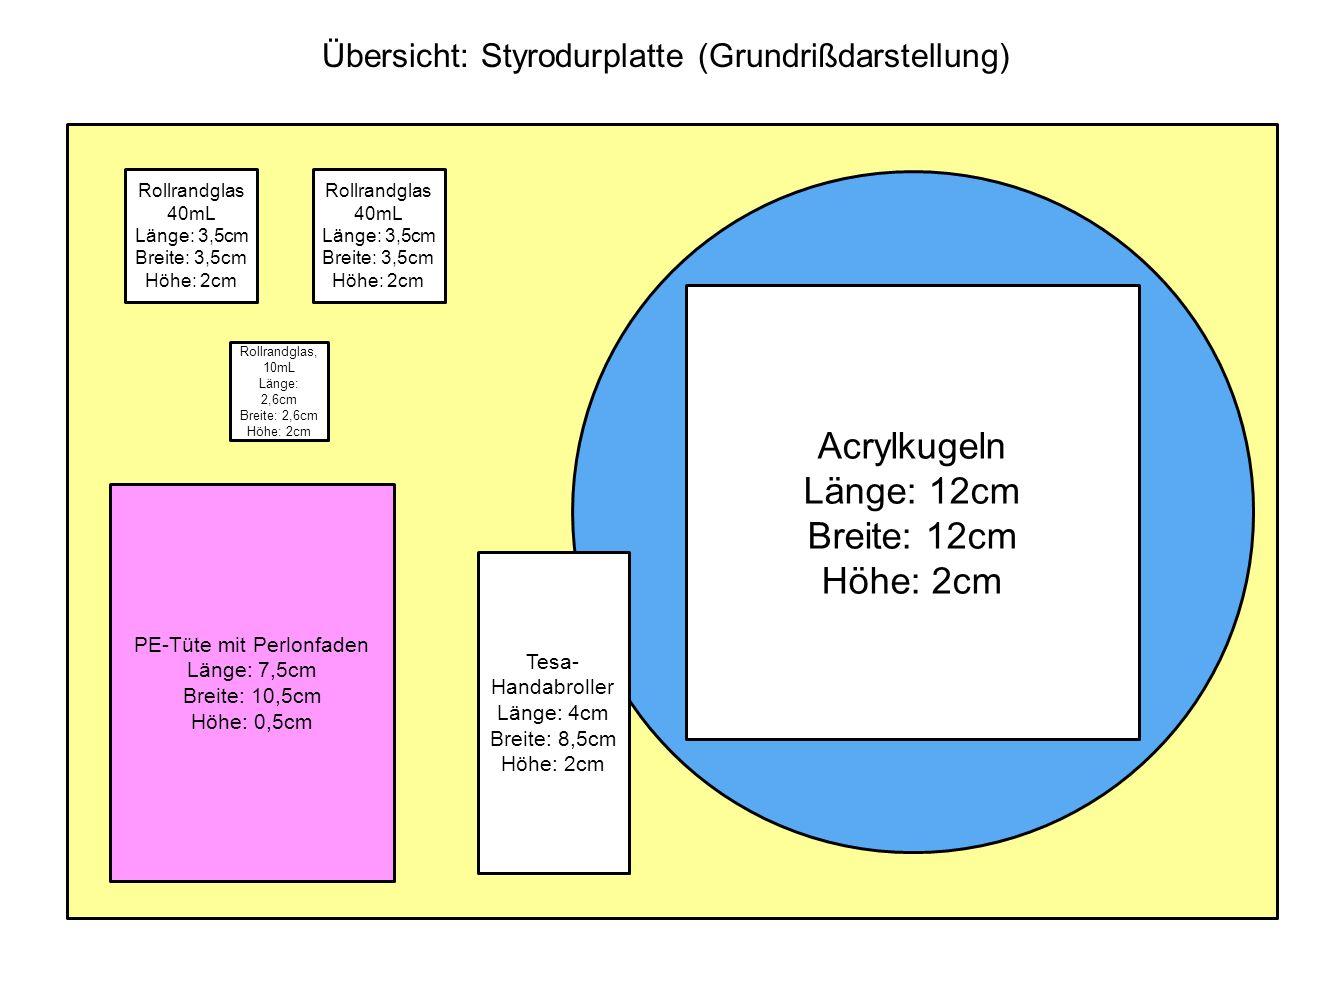 Acrylkugeln Länge: 12cm Breite: 12cm Höhe: 2cm PE-Tüte mit Perlonfaden Länge: 7,5cm Breite: 10,5cm Höhe: 0,5cm Tesa- Handabroller Länge: 4cm Breite: 8